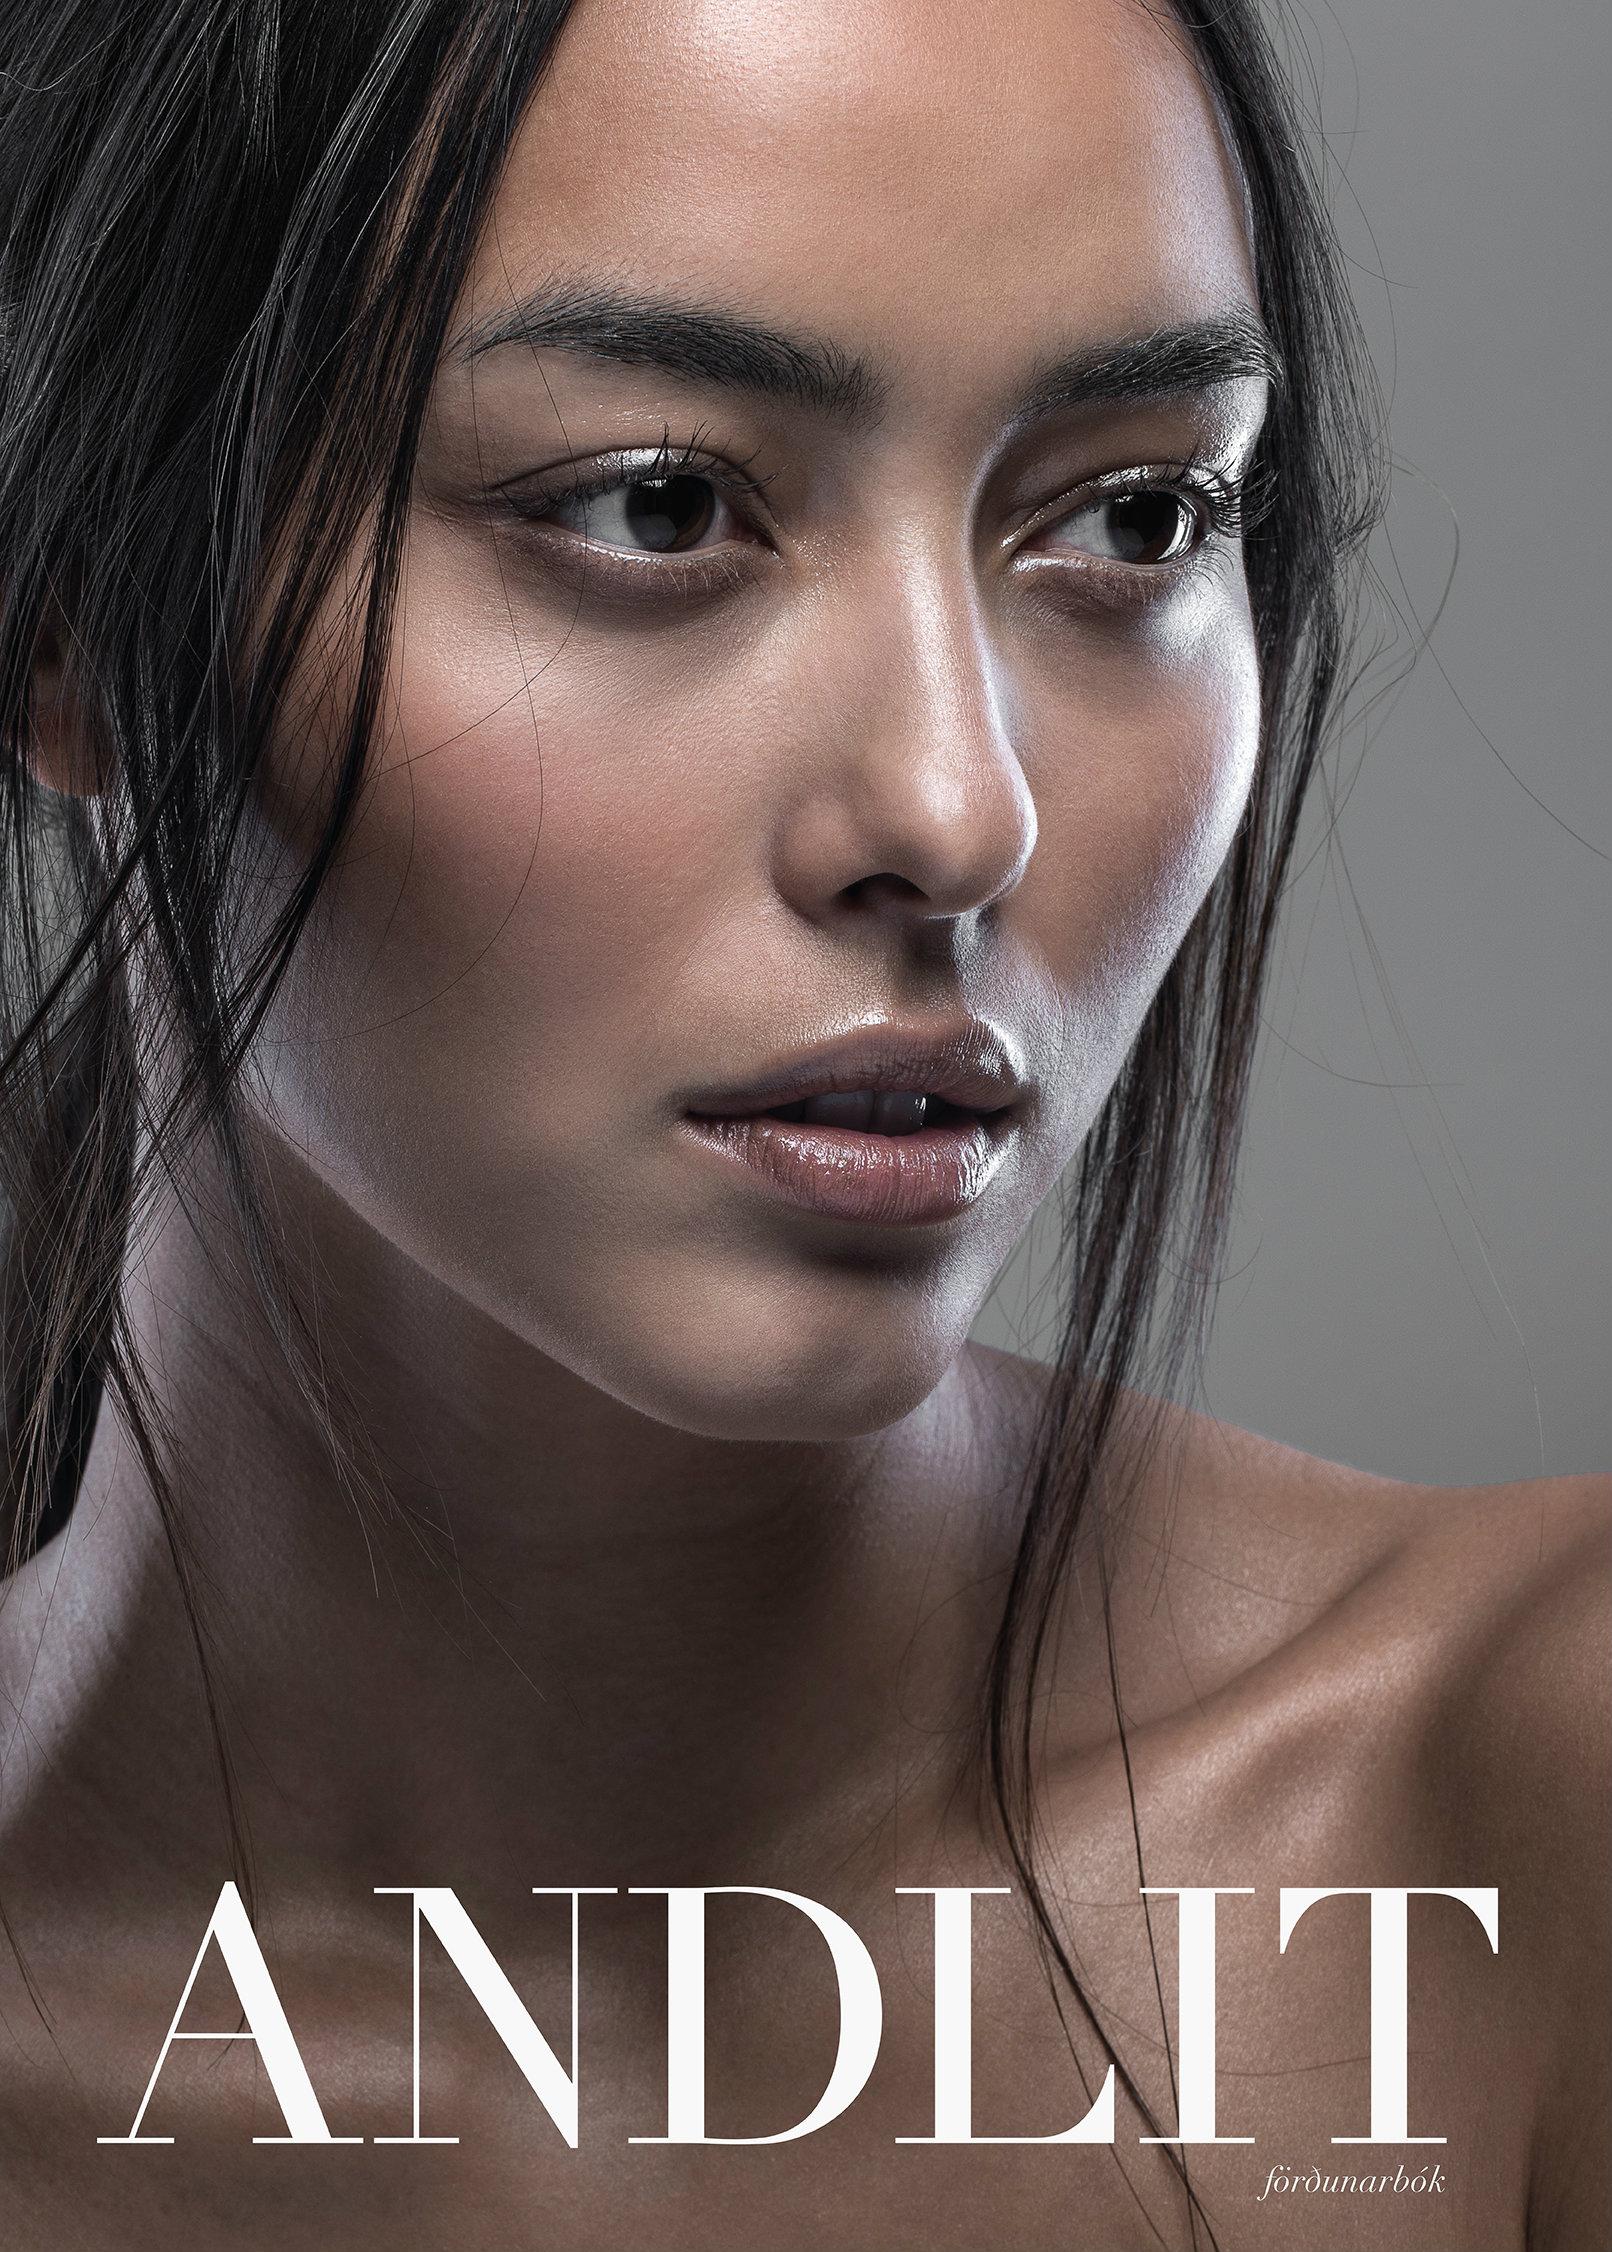 Andlit